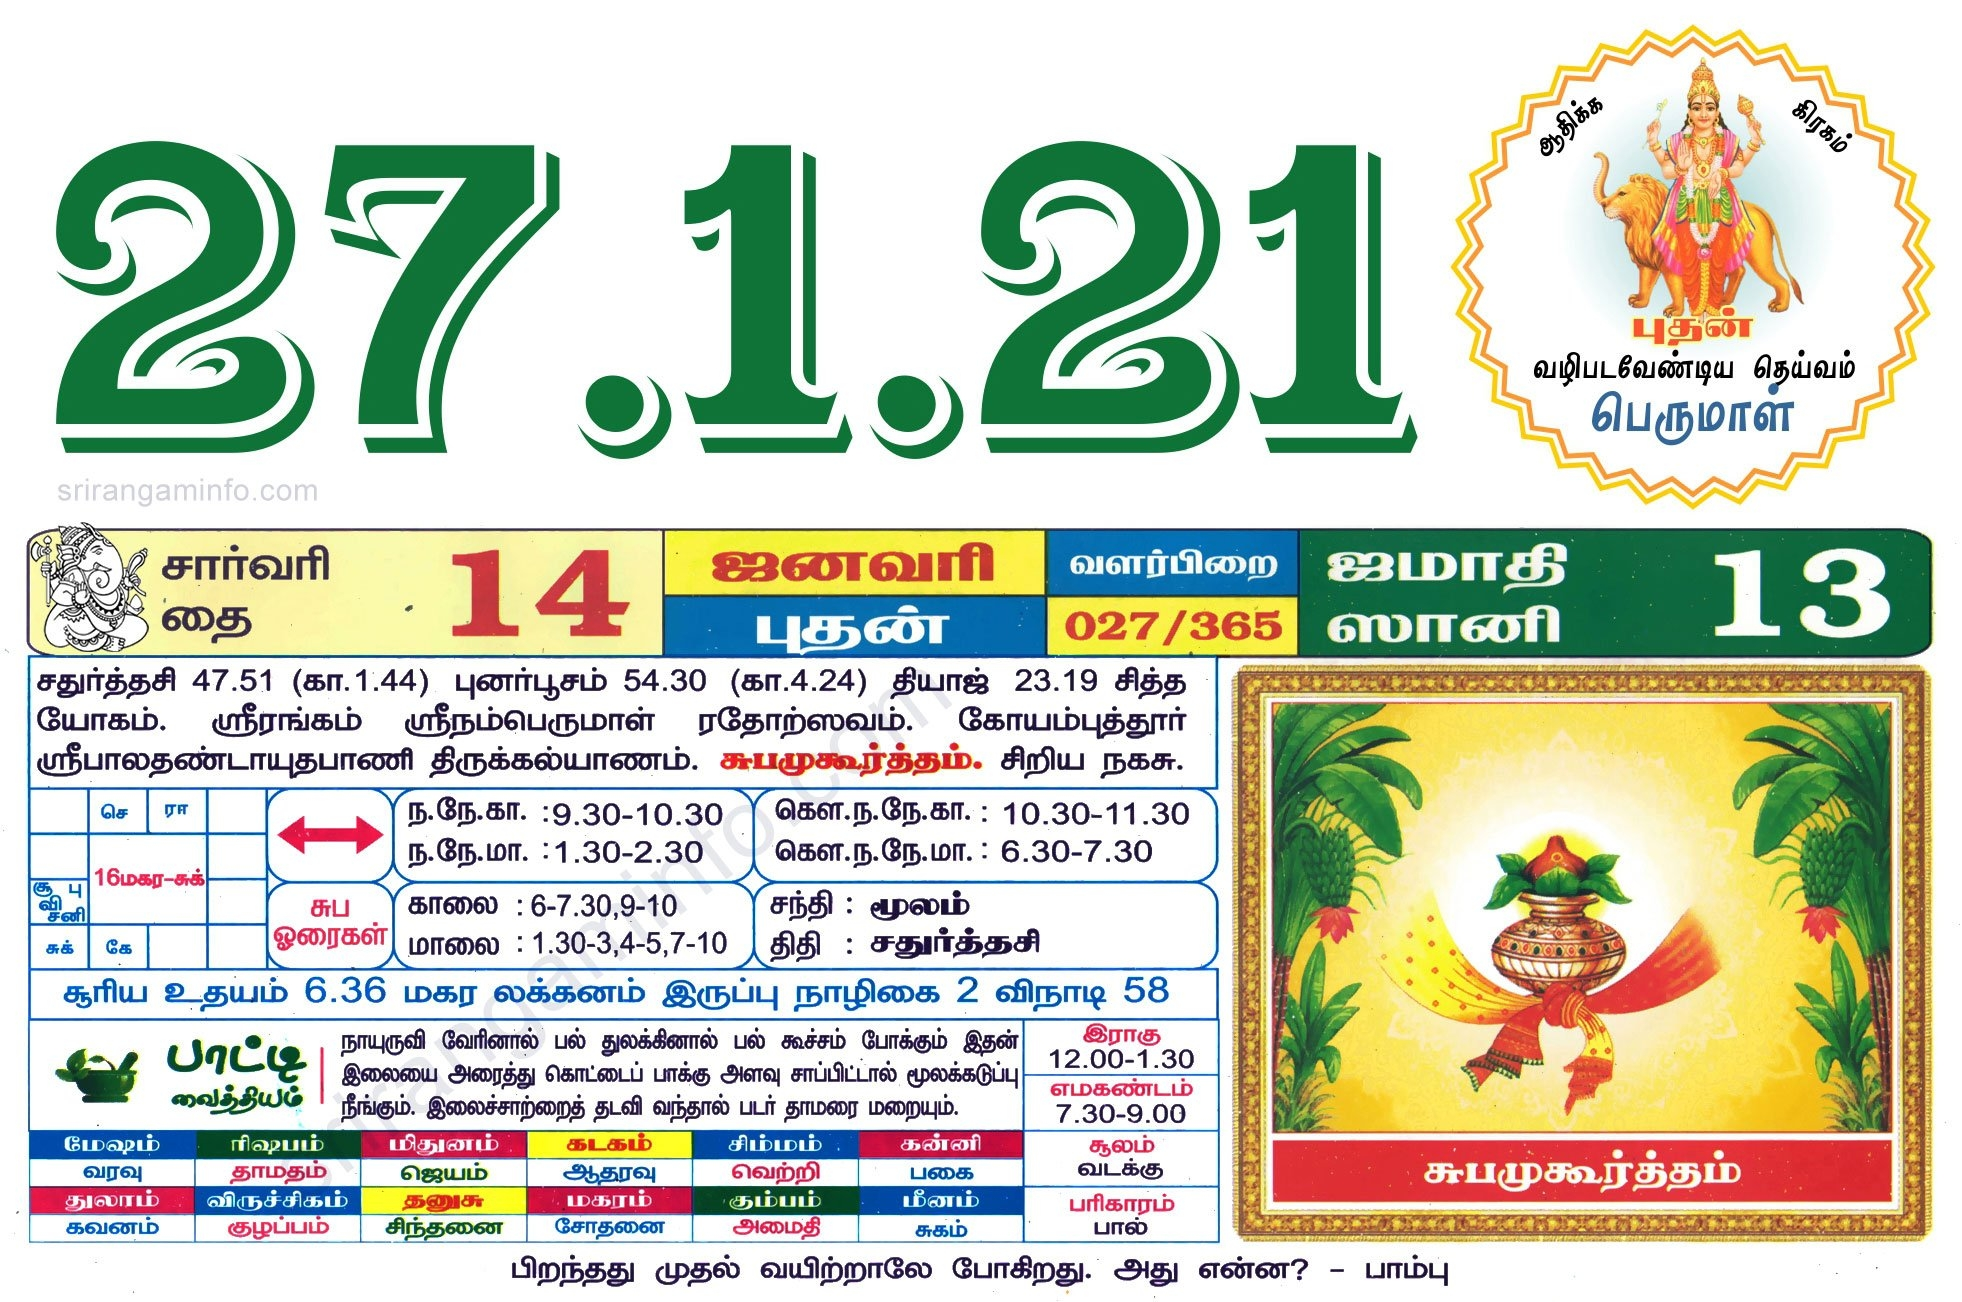 Tamil Daily Calendar 2021, Tamil Calendar 2021, Nalla Neram - தமிழ் தினசரி காலண்டர் with regard to Calender Kuda In Tamil 2021